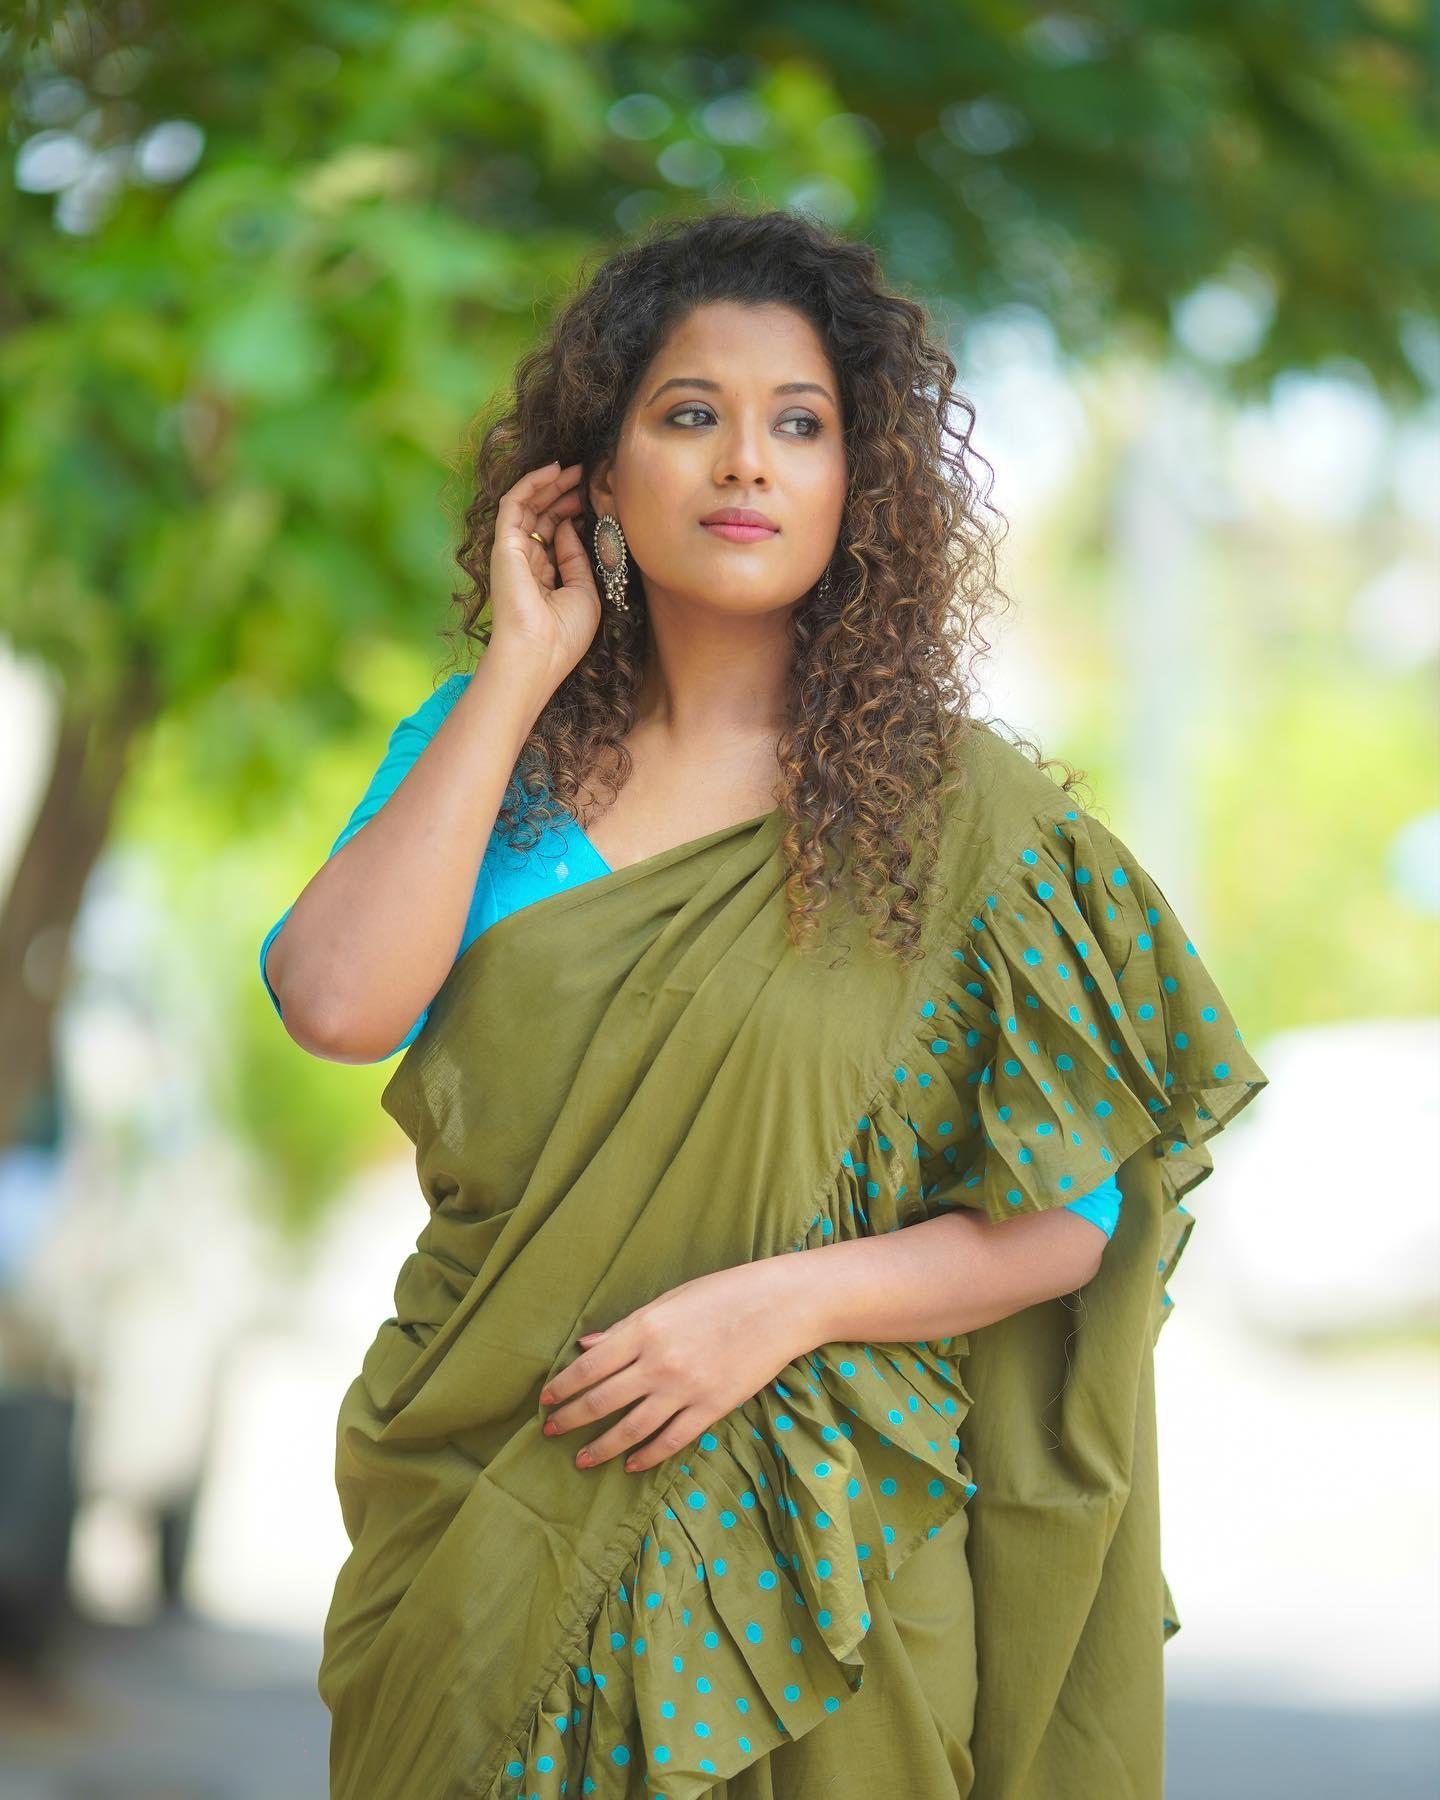 Beautiful mehandi green ruffle saree with poolka dots. 2021-07-22